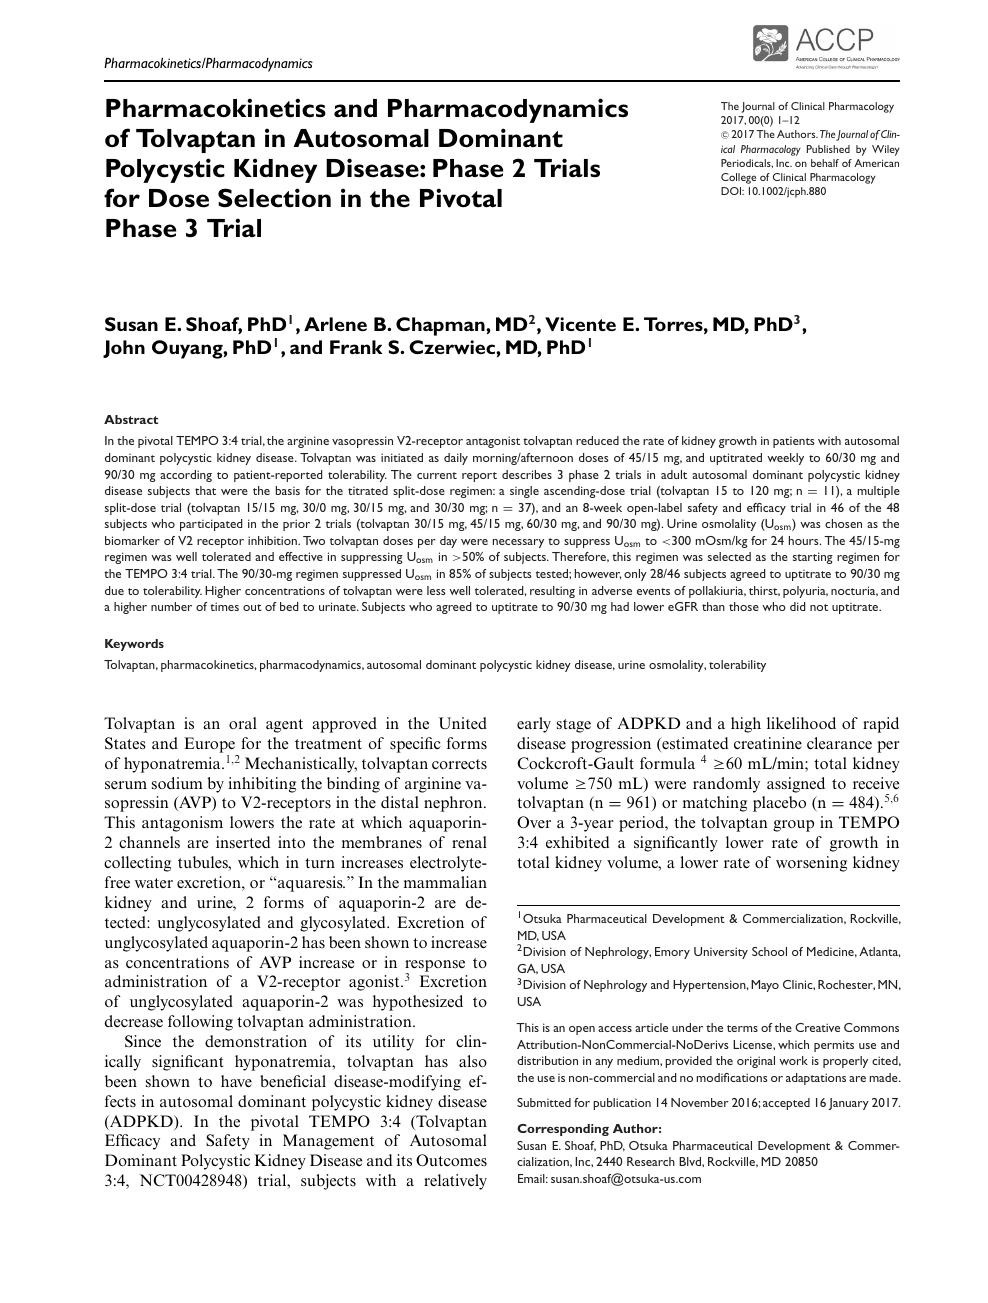 Pharmacokinetics and Pharmacodynamics of Tolvaptan in